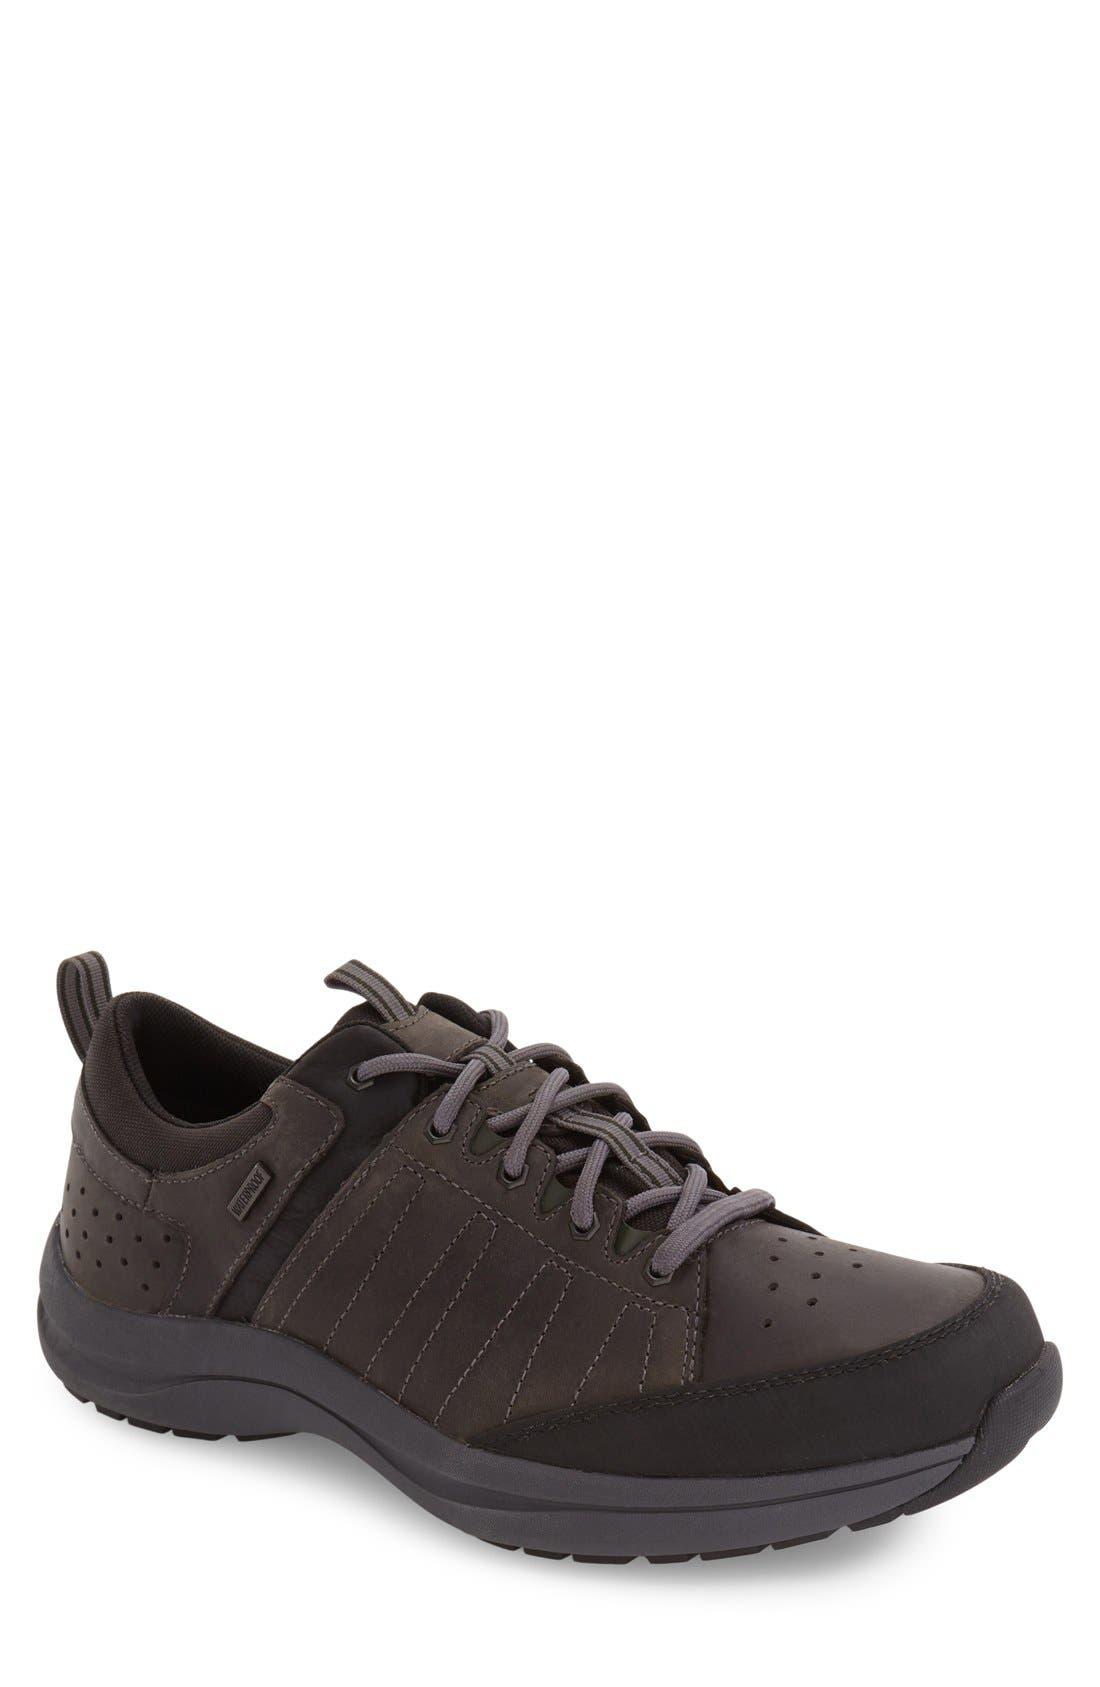 Dunham Seth-Dun Waterproof Sneaker (Men